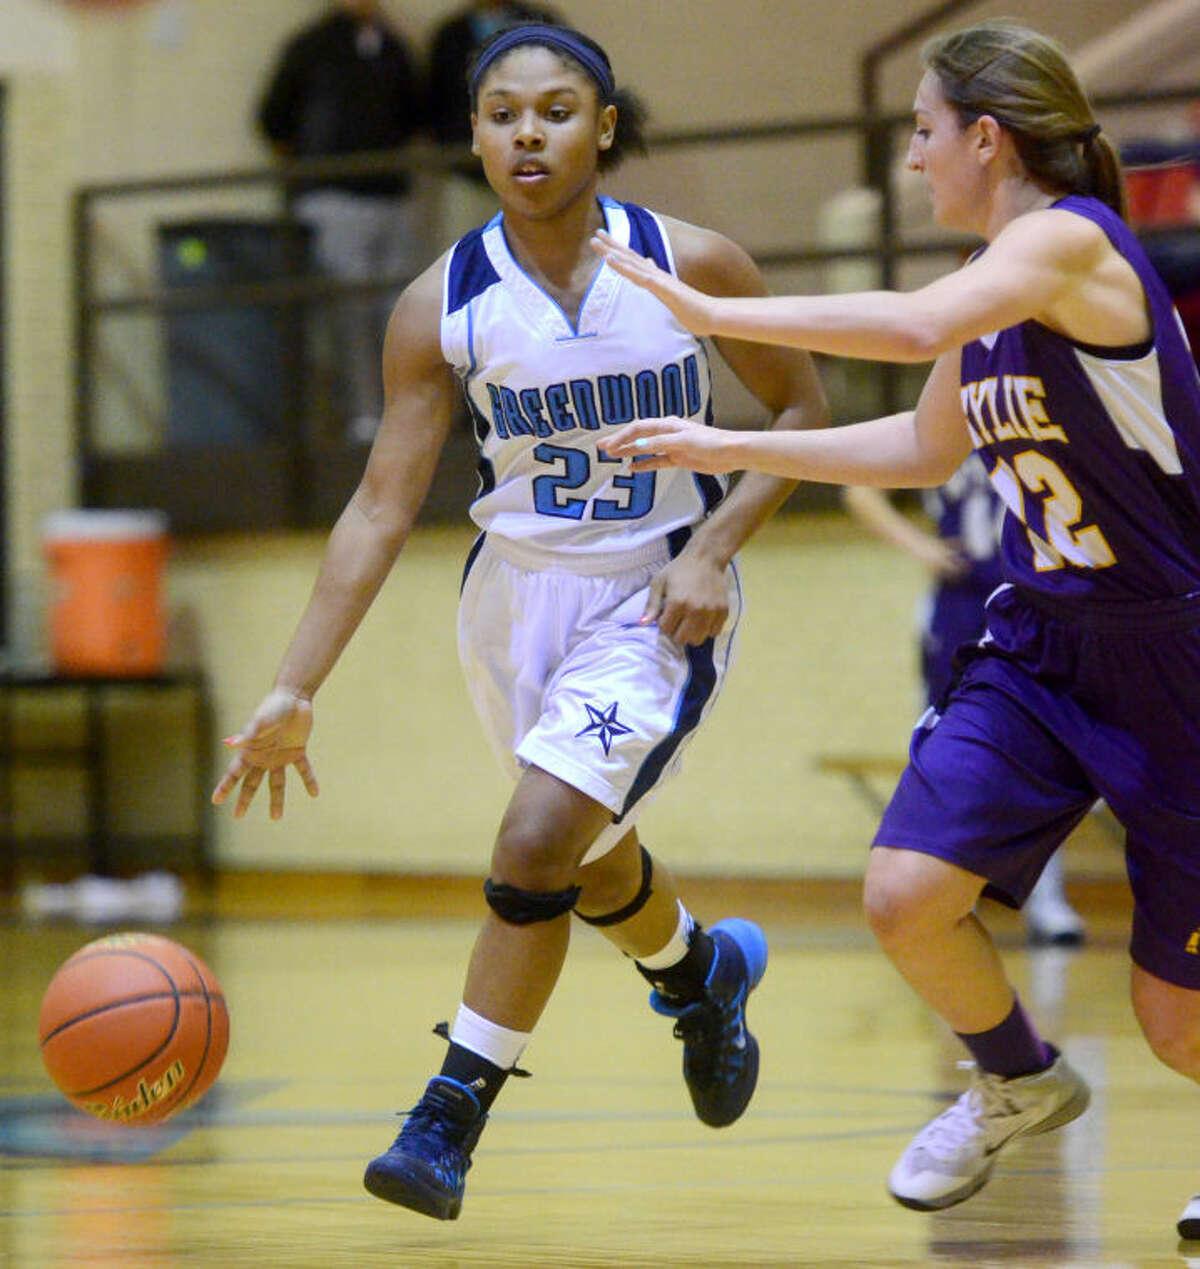 Greenwood's Oriana Ortiz (23) takes the ball down the court against Abilene Wylie's Ragan Henson (12) on Jan. 31 at Greenwood. James Durbin/Reporter-Telegram